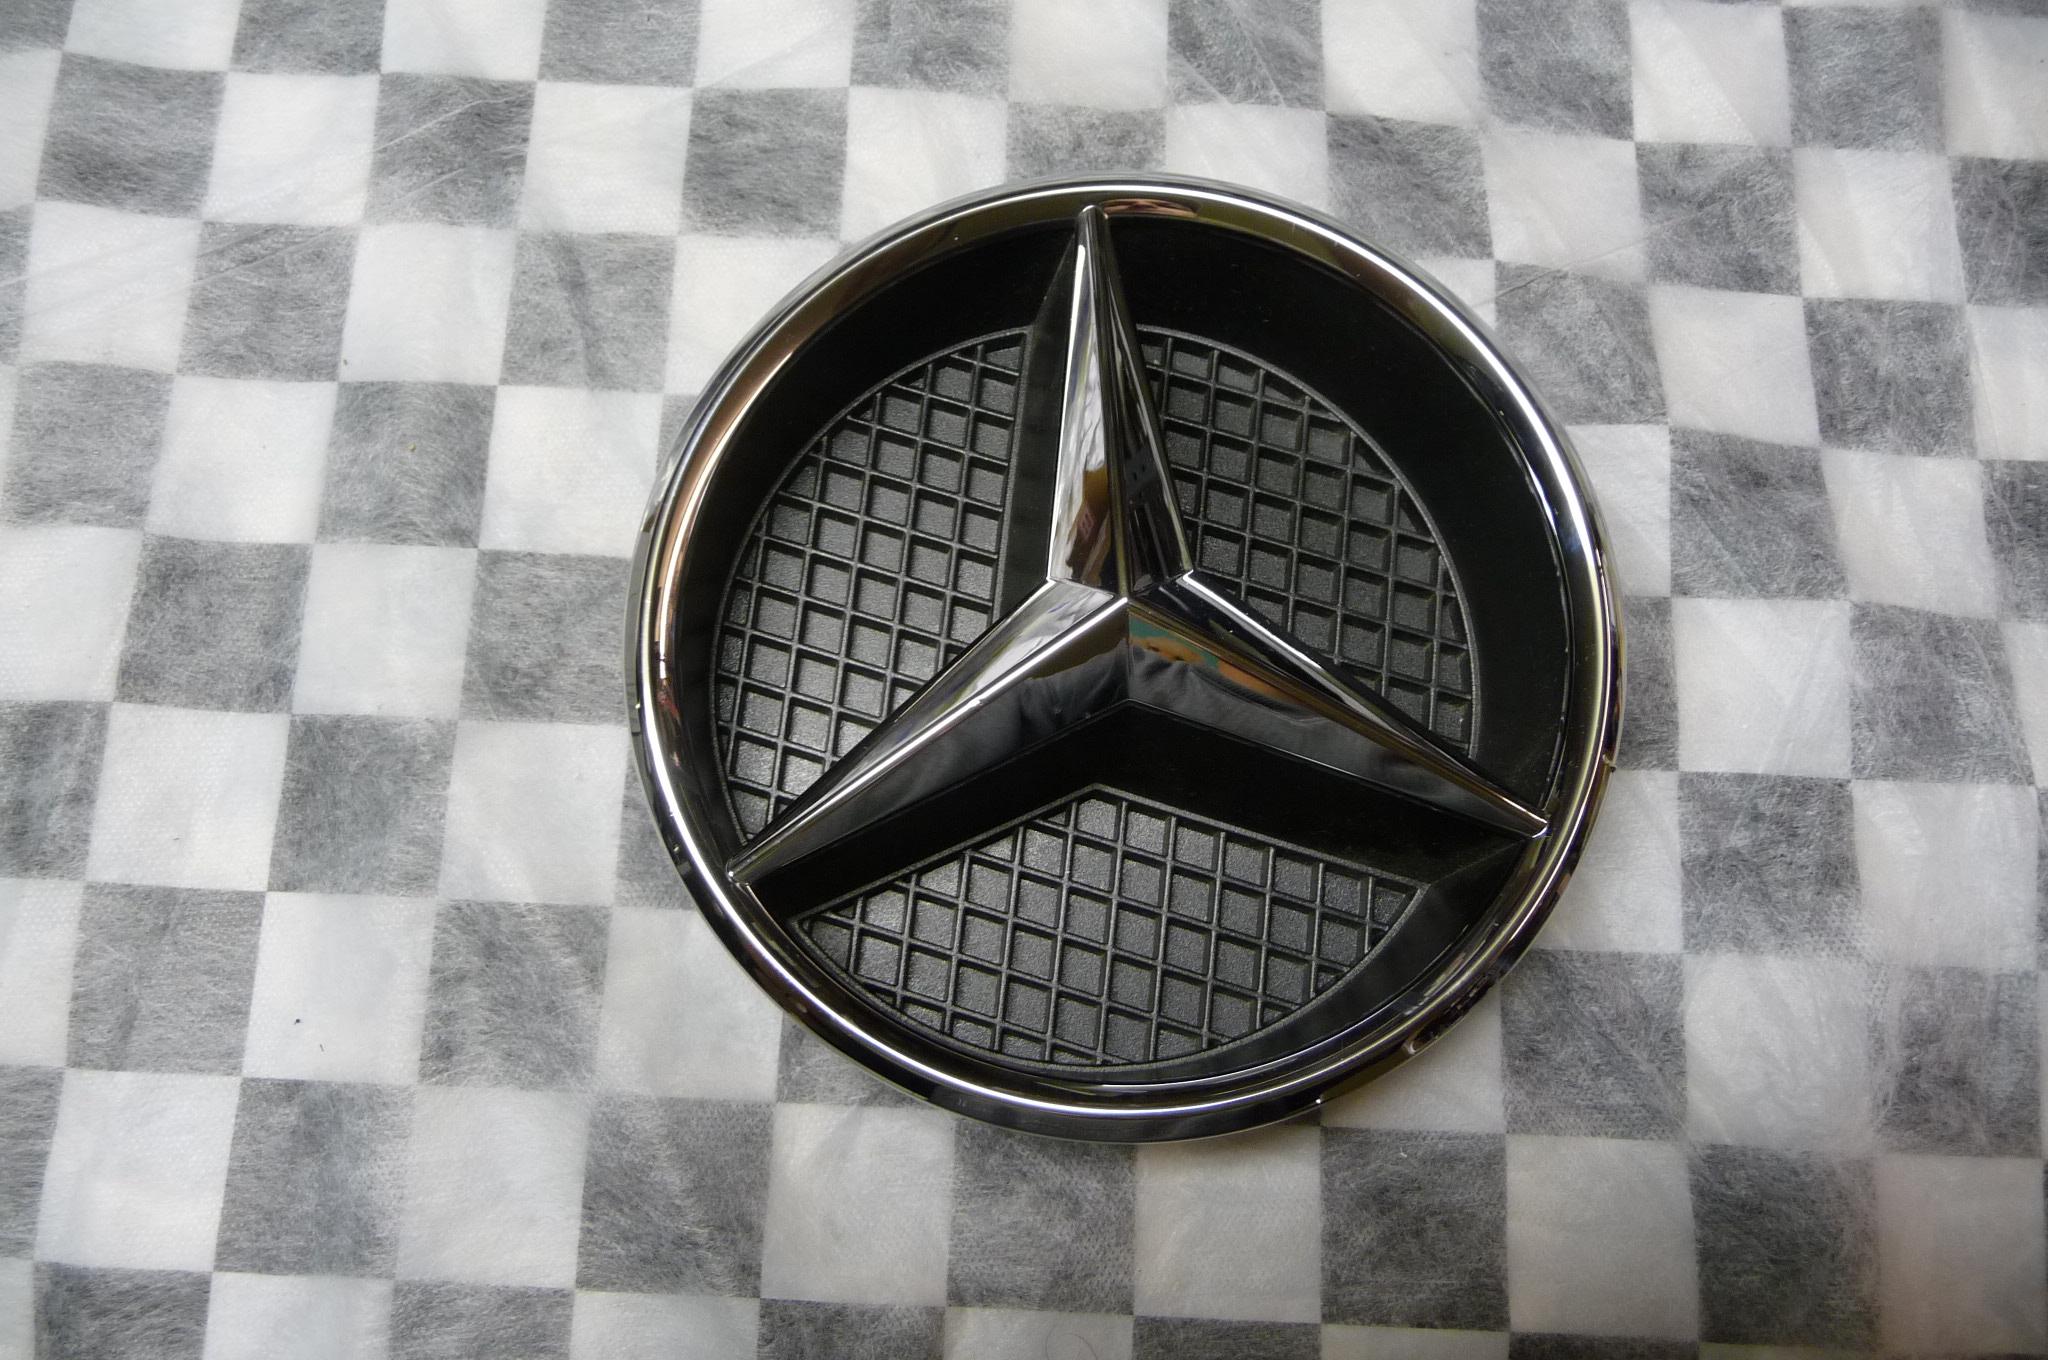 Mercedes Benz C CLA GL ML R Class Front Grille Star Emblem A0008880060 OEM